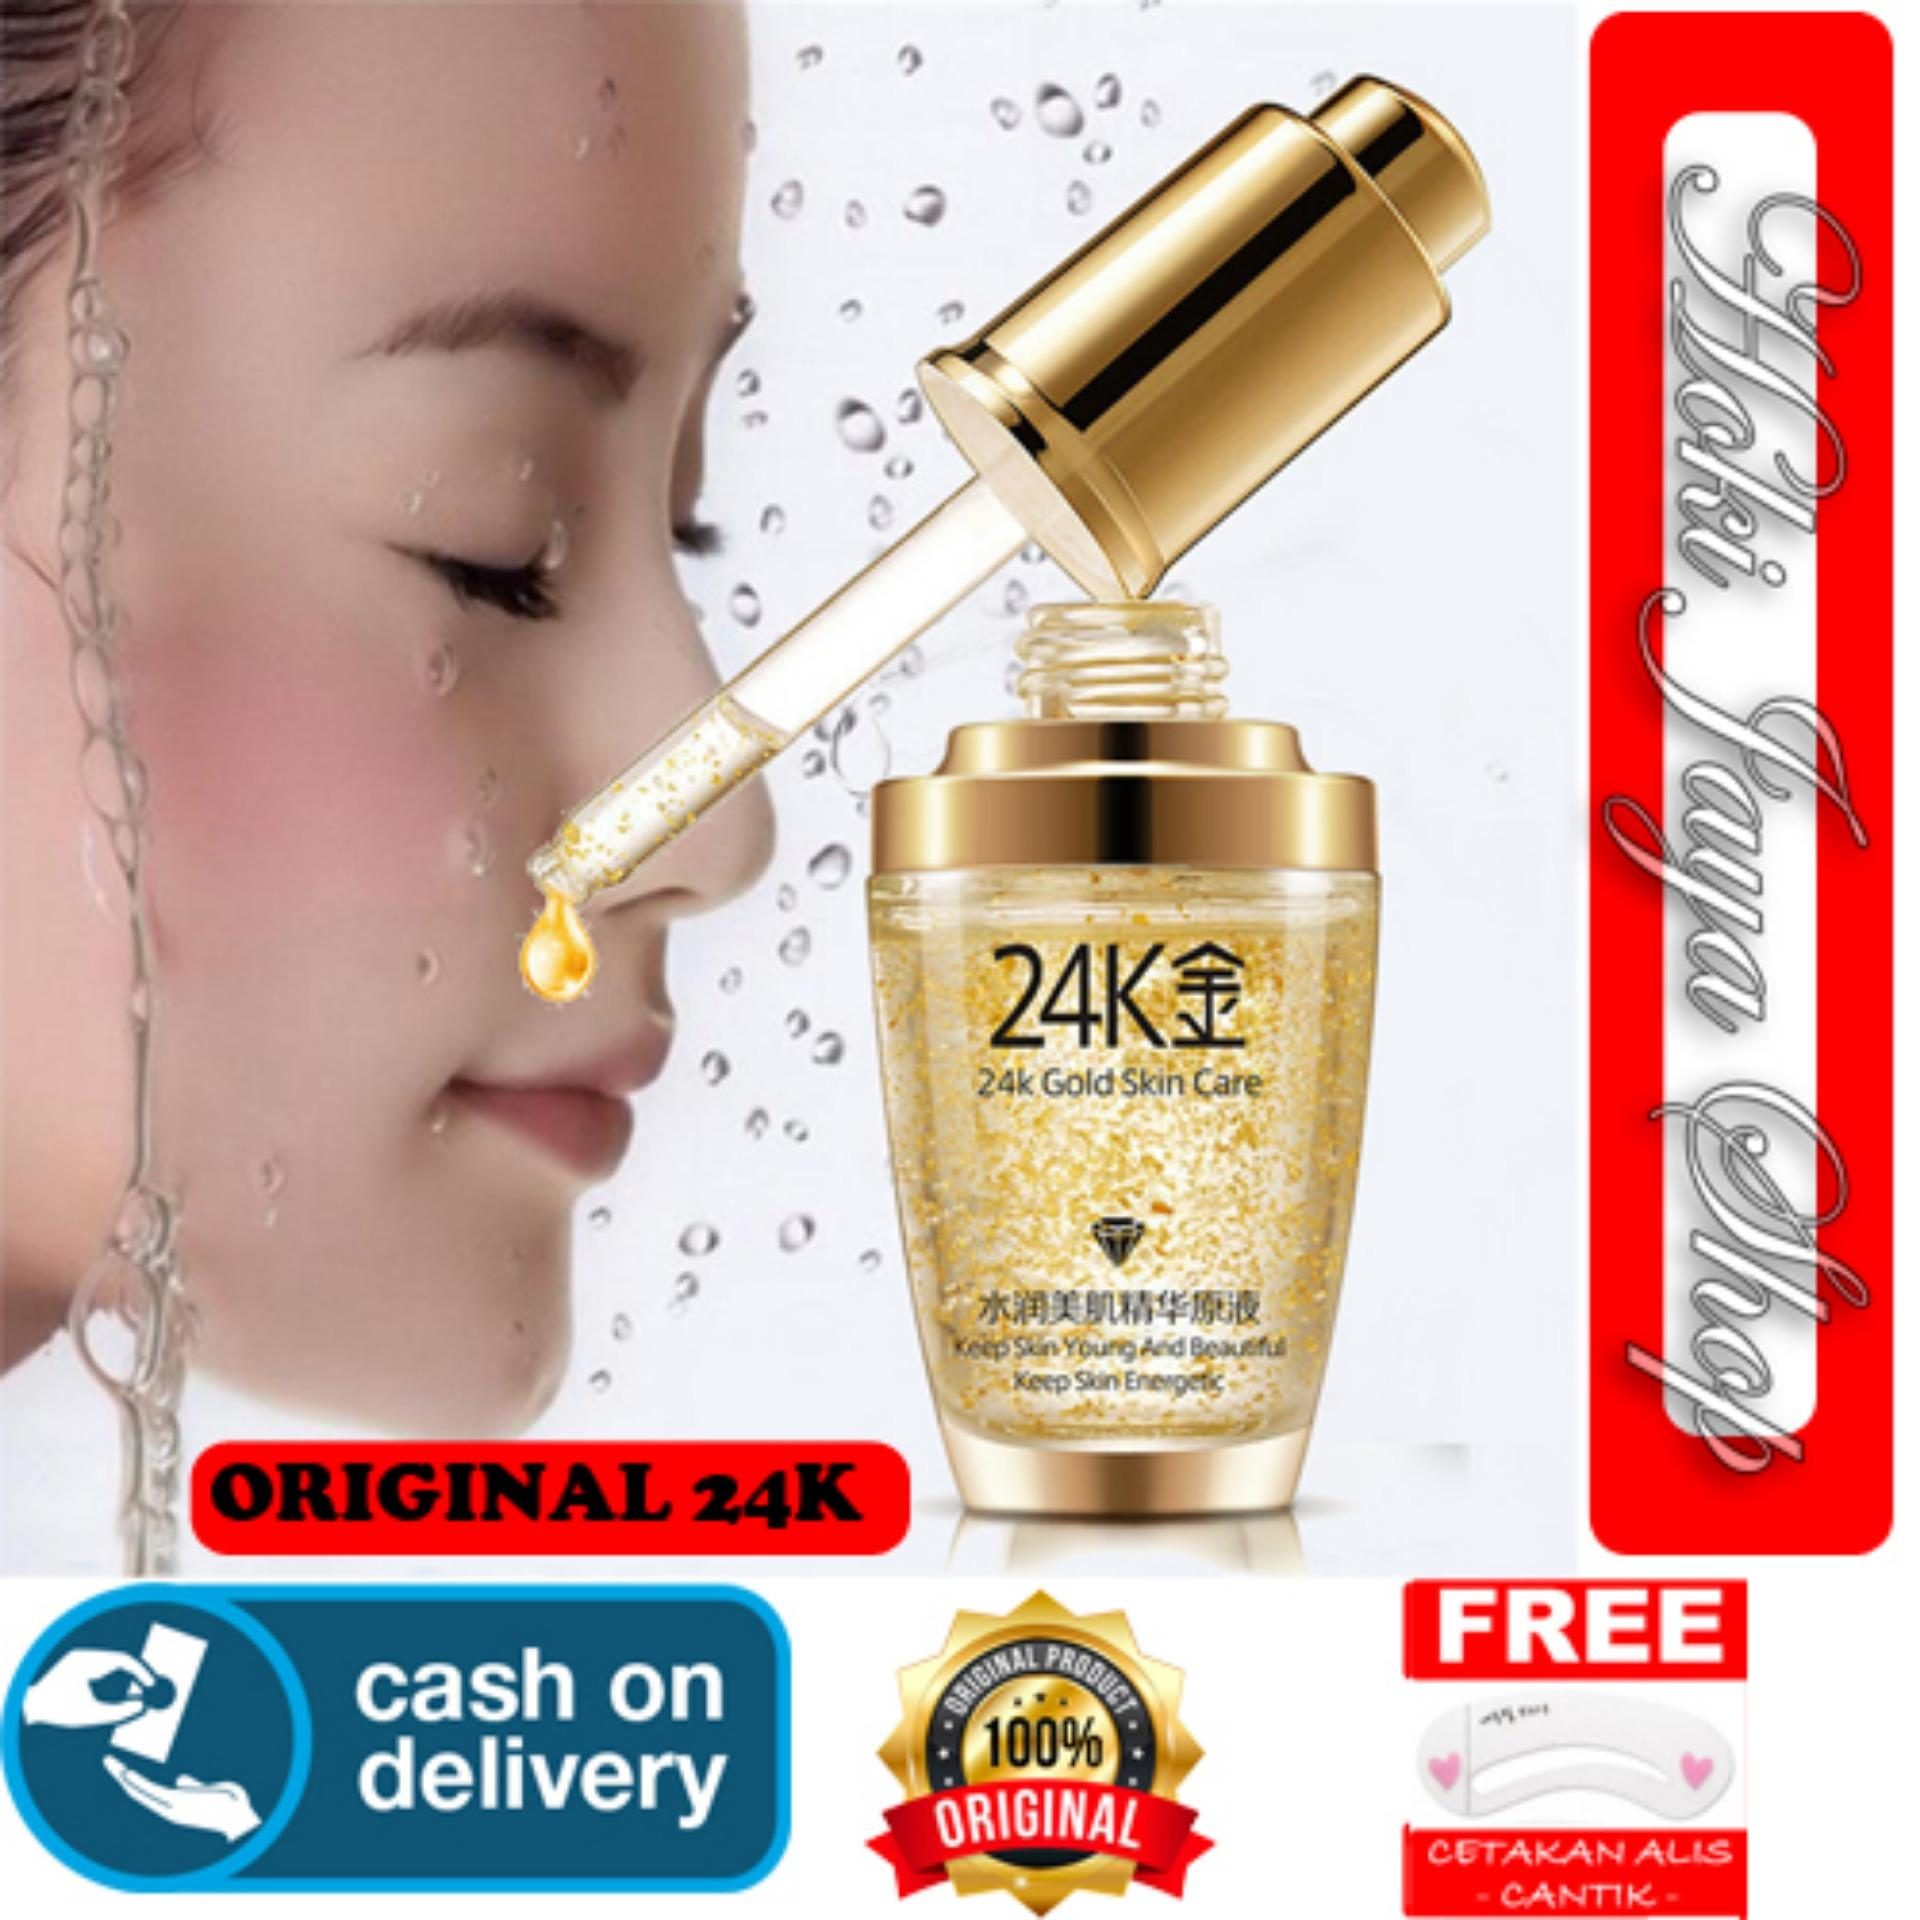 HOKI COD - Serum Wajah Emas 24K Bioaqua 24k Gold Bioaqua bb Cushion Skin Care Penghilang Kantung Mata dan Kerutan Wajah + Gratis Cetak Alis Cantik Premium - 1 Pcs